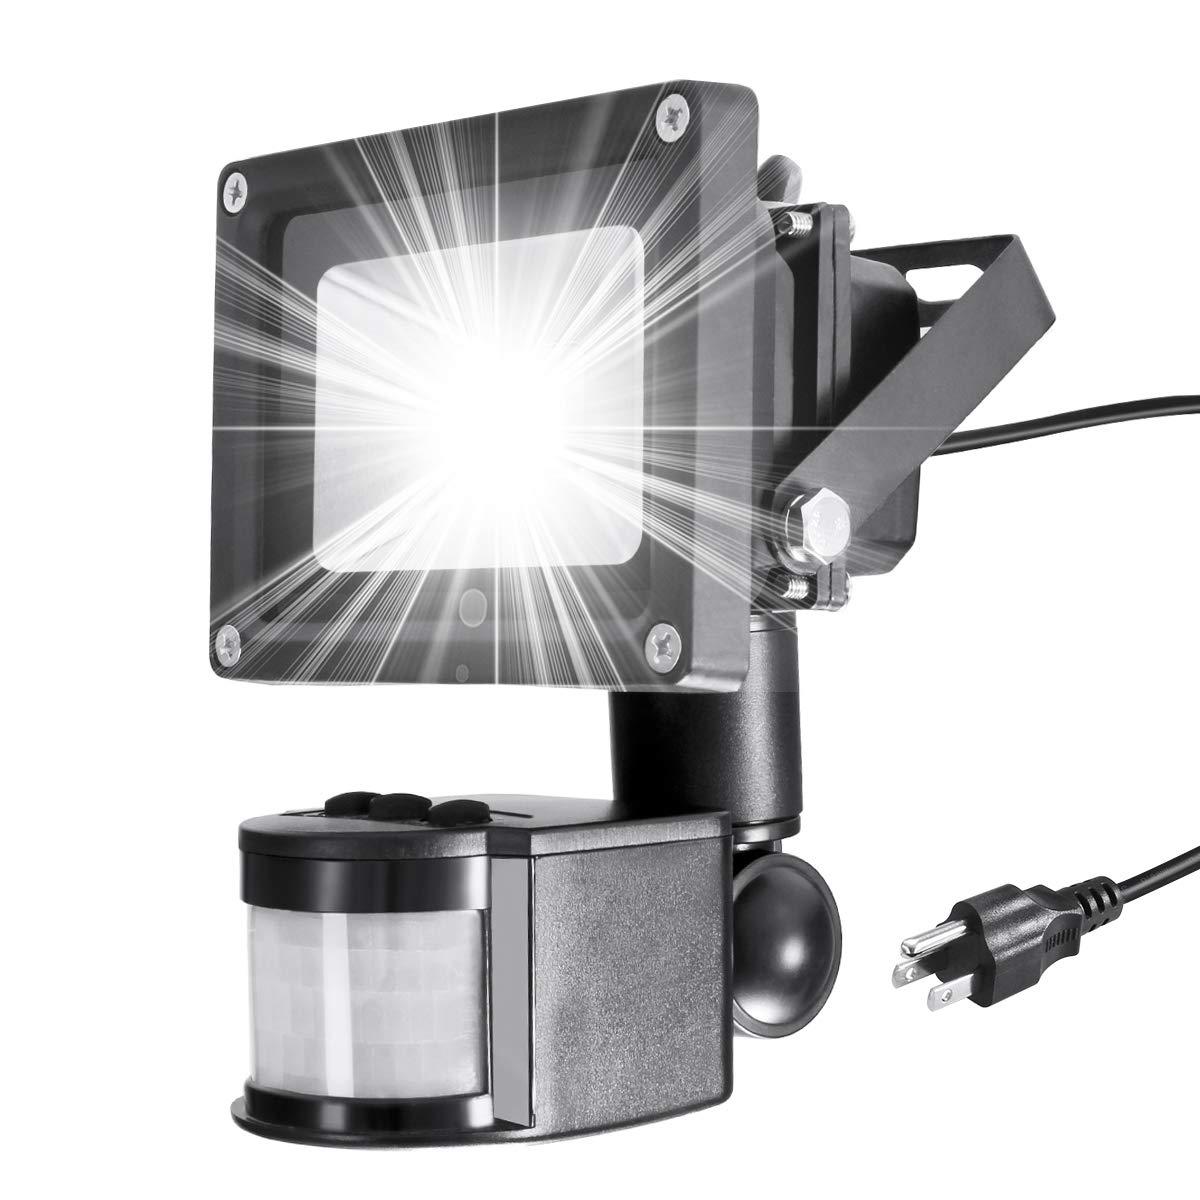 Warmoon LED Motion Sensor Flood Light 10W Outdoor IP65 Waterproof 6500K Daylight White Security Wall lighting With Sensitive Detector